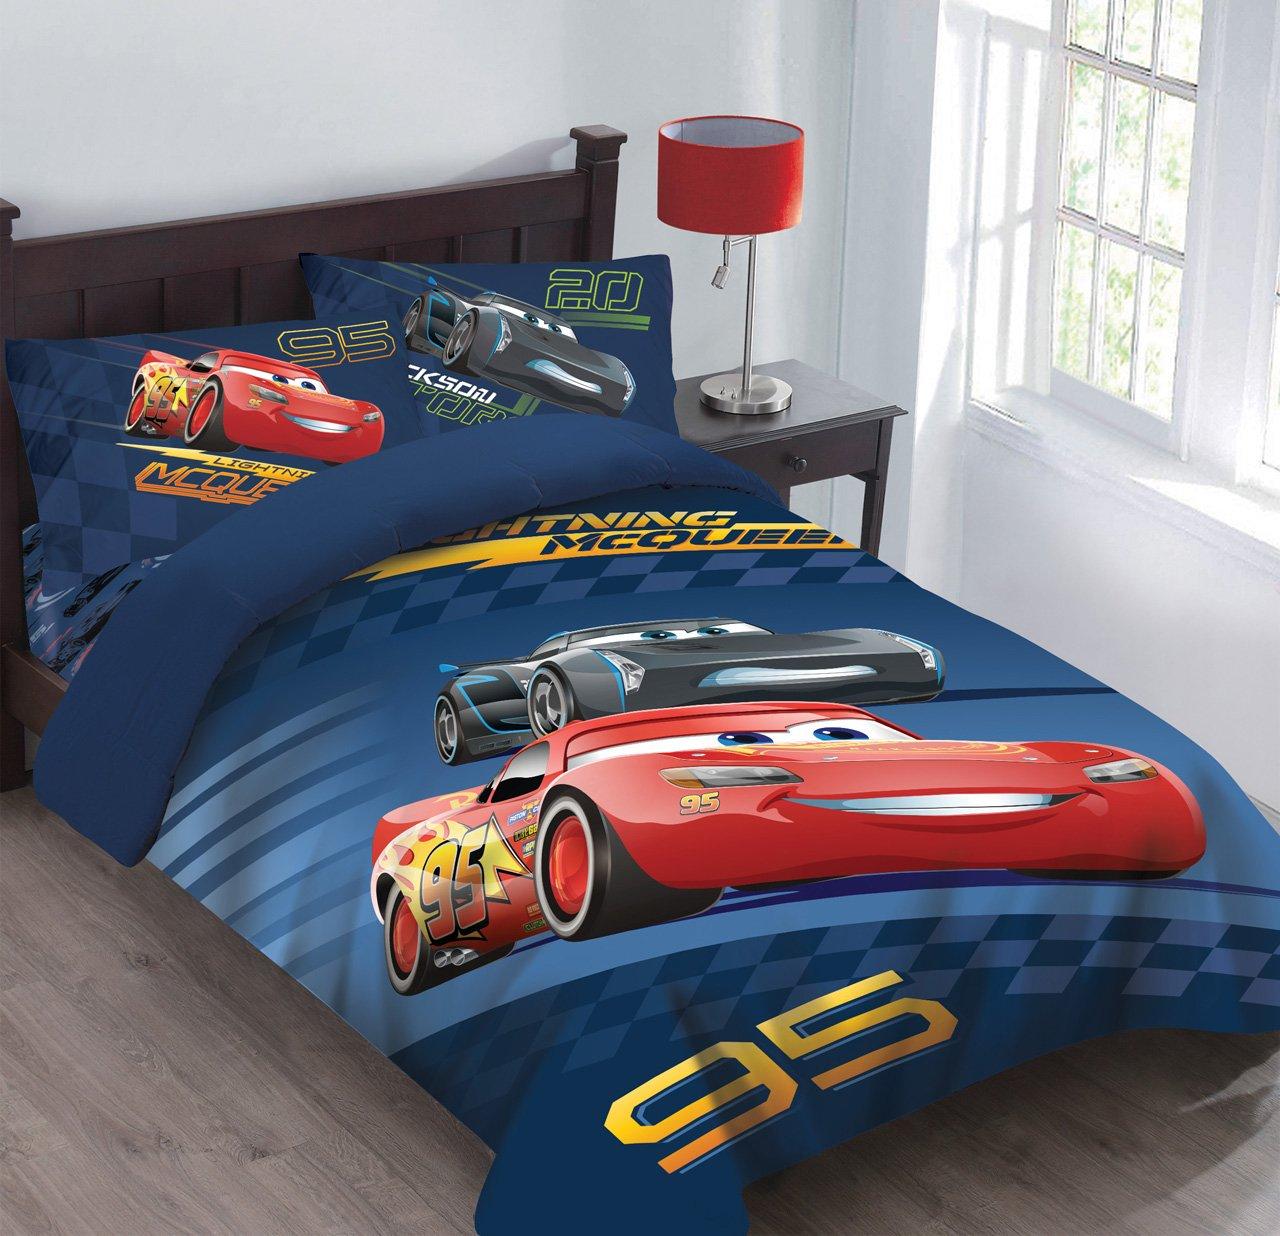 Disney Cars Velocity Twin Bedding Comforter Set by Disney